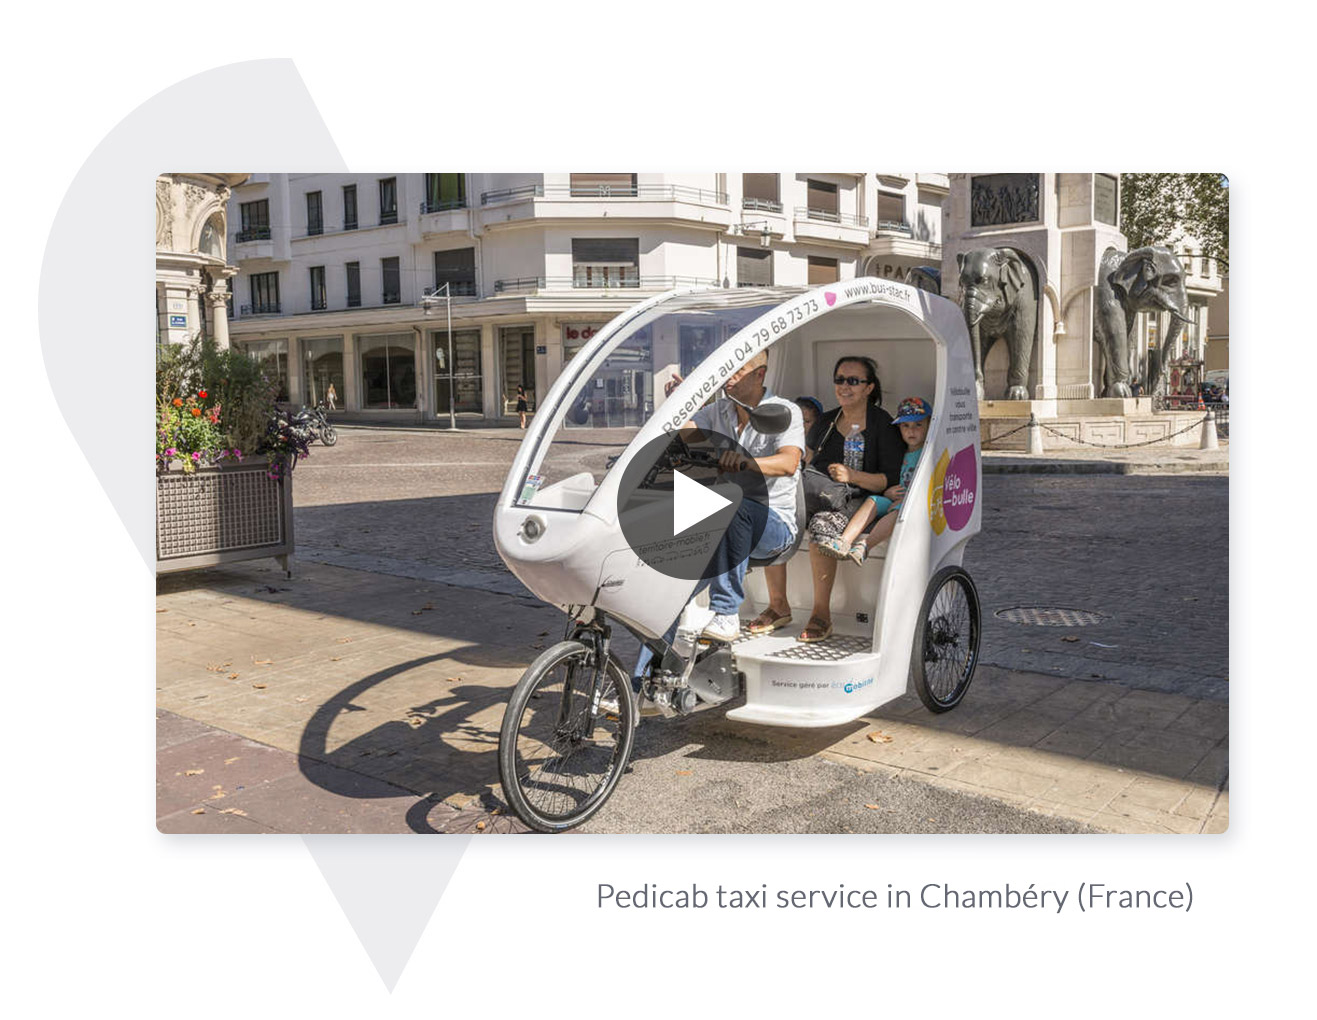 pedicab taxi service